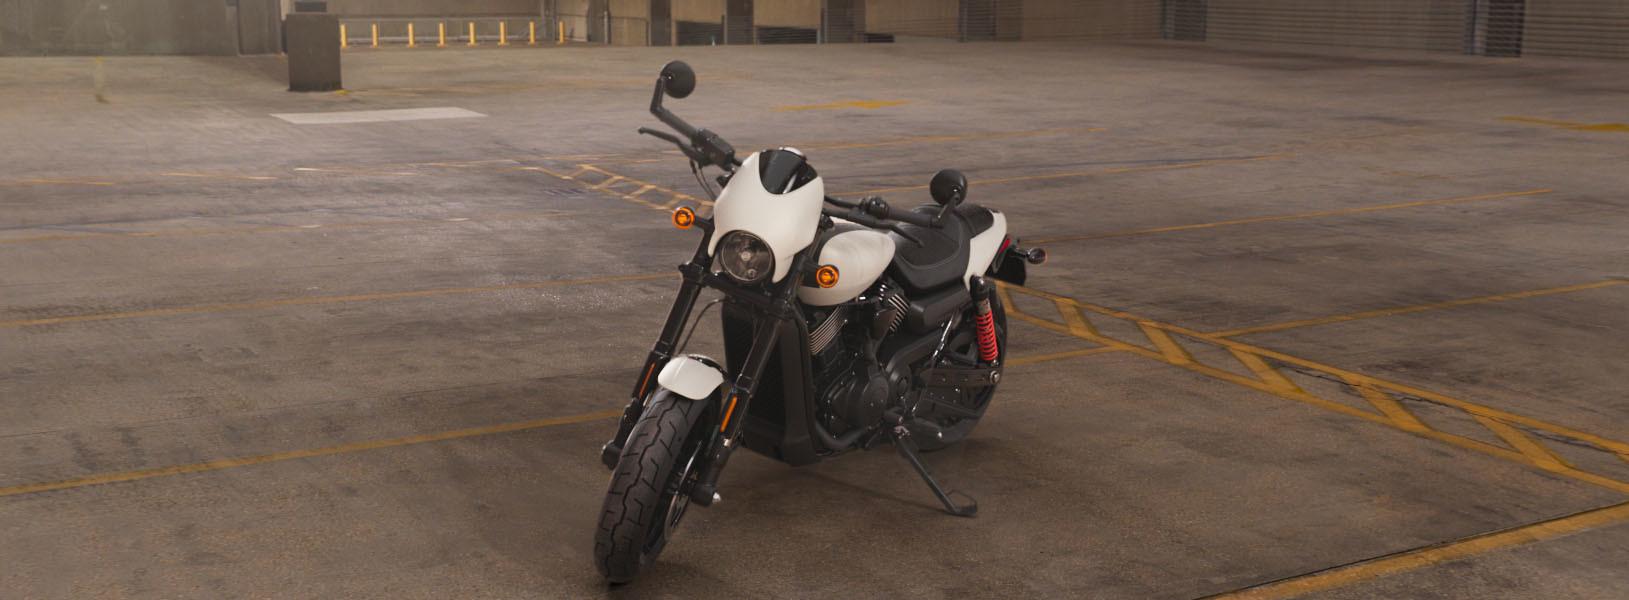 Street Rod™ | Brandywine Harley-Davidson®